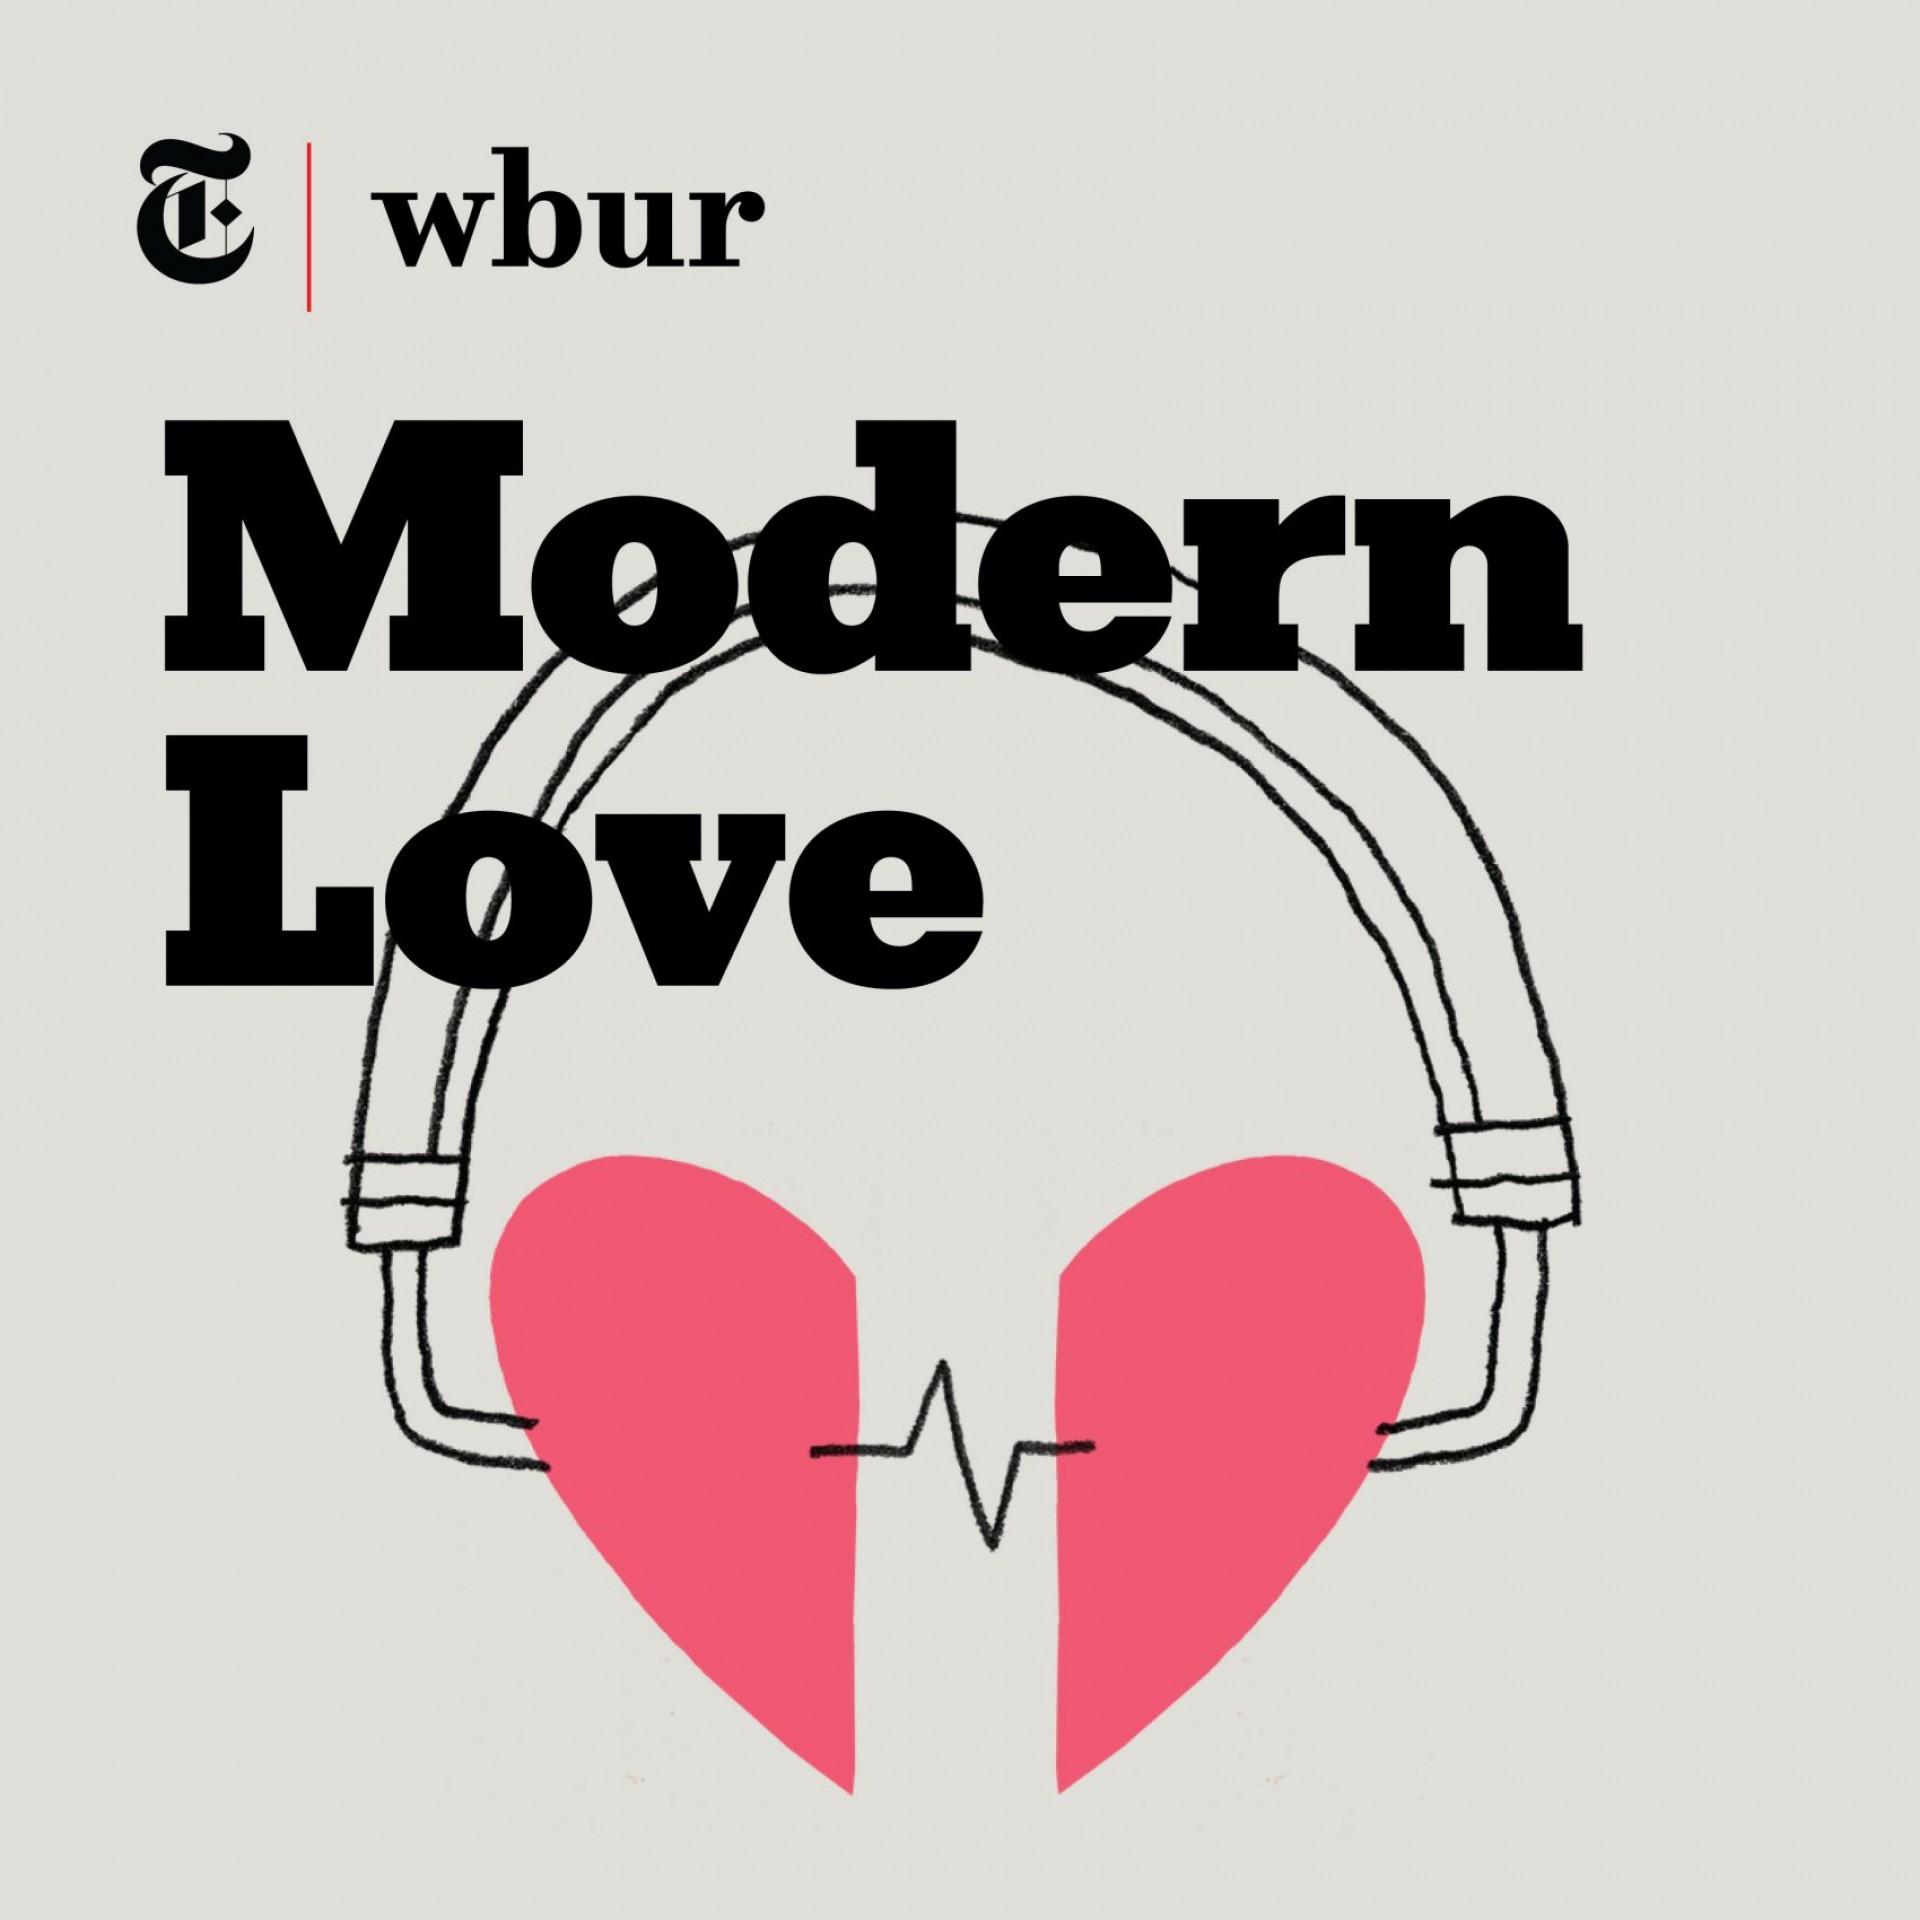 012 Tile Modern Love Essay Example College Impressive Contest 2016 1920